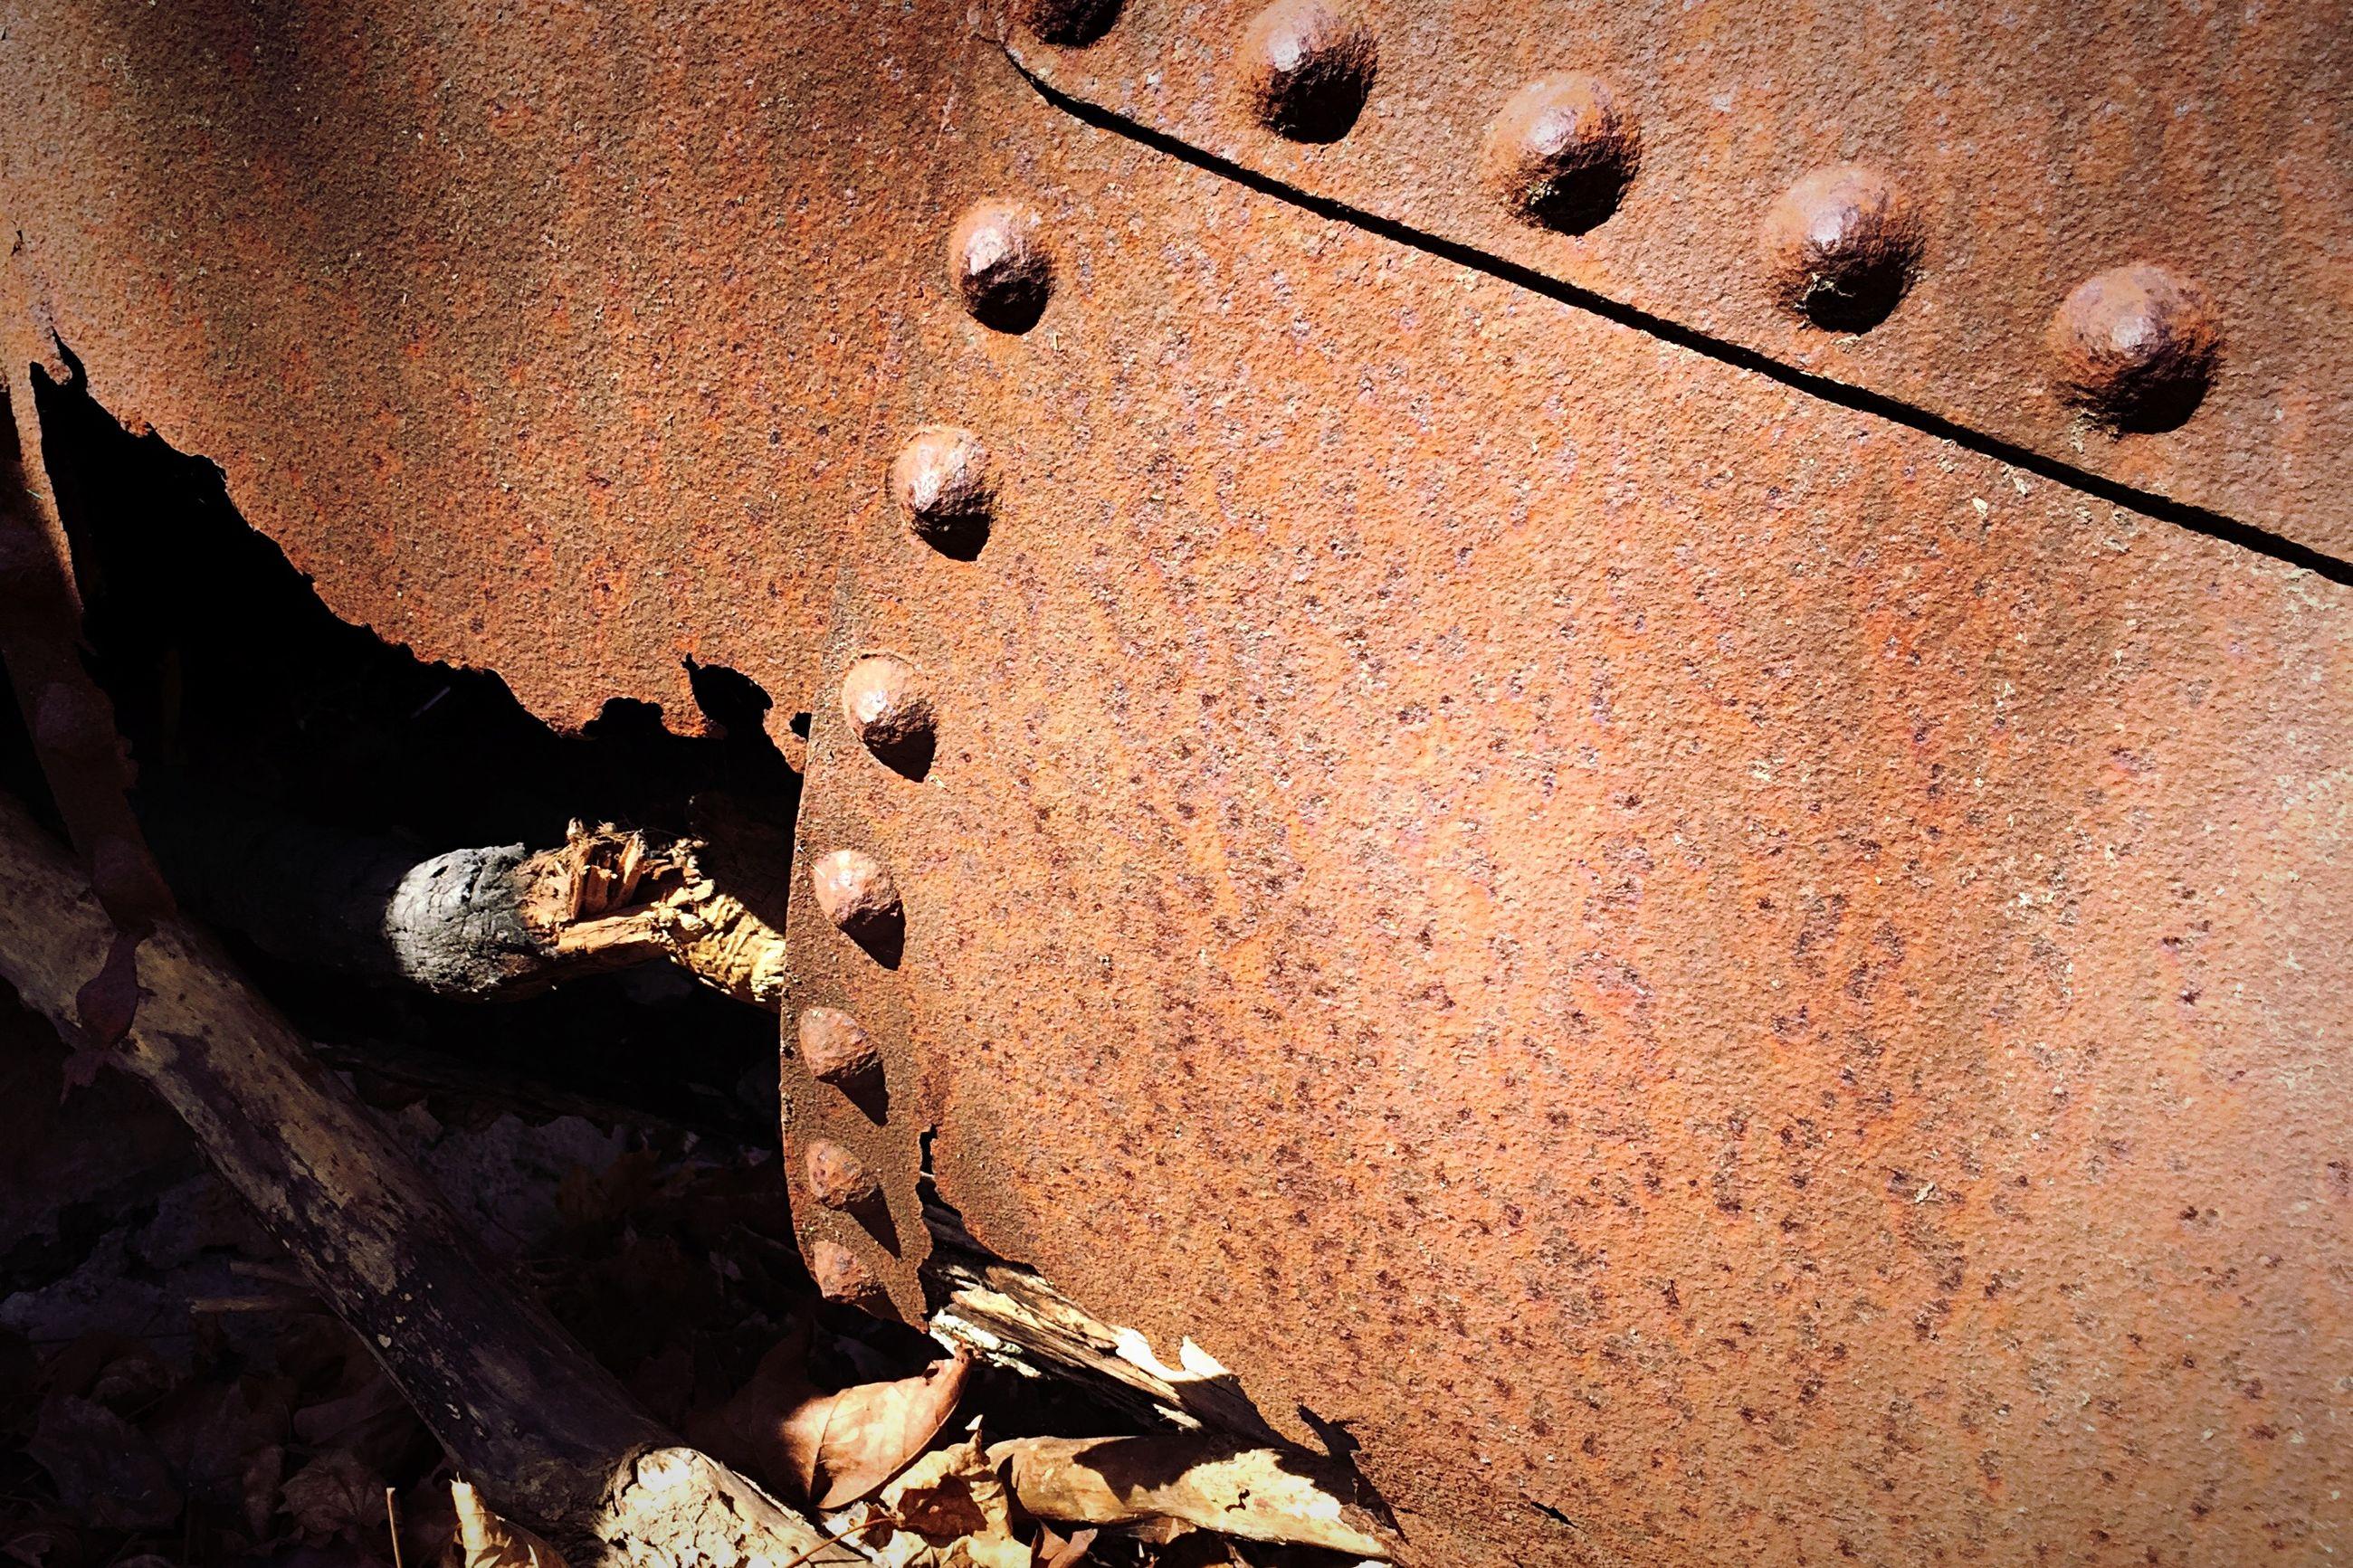 Close-up of rusty shipwreck